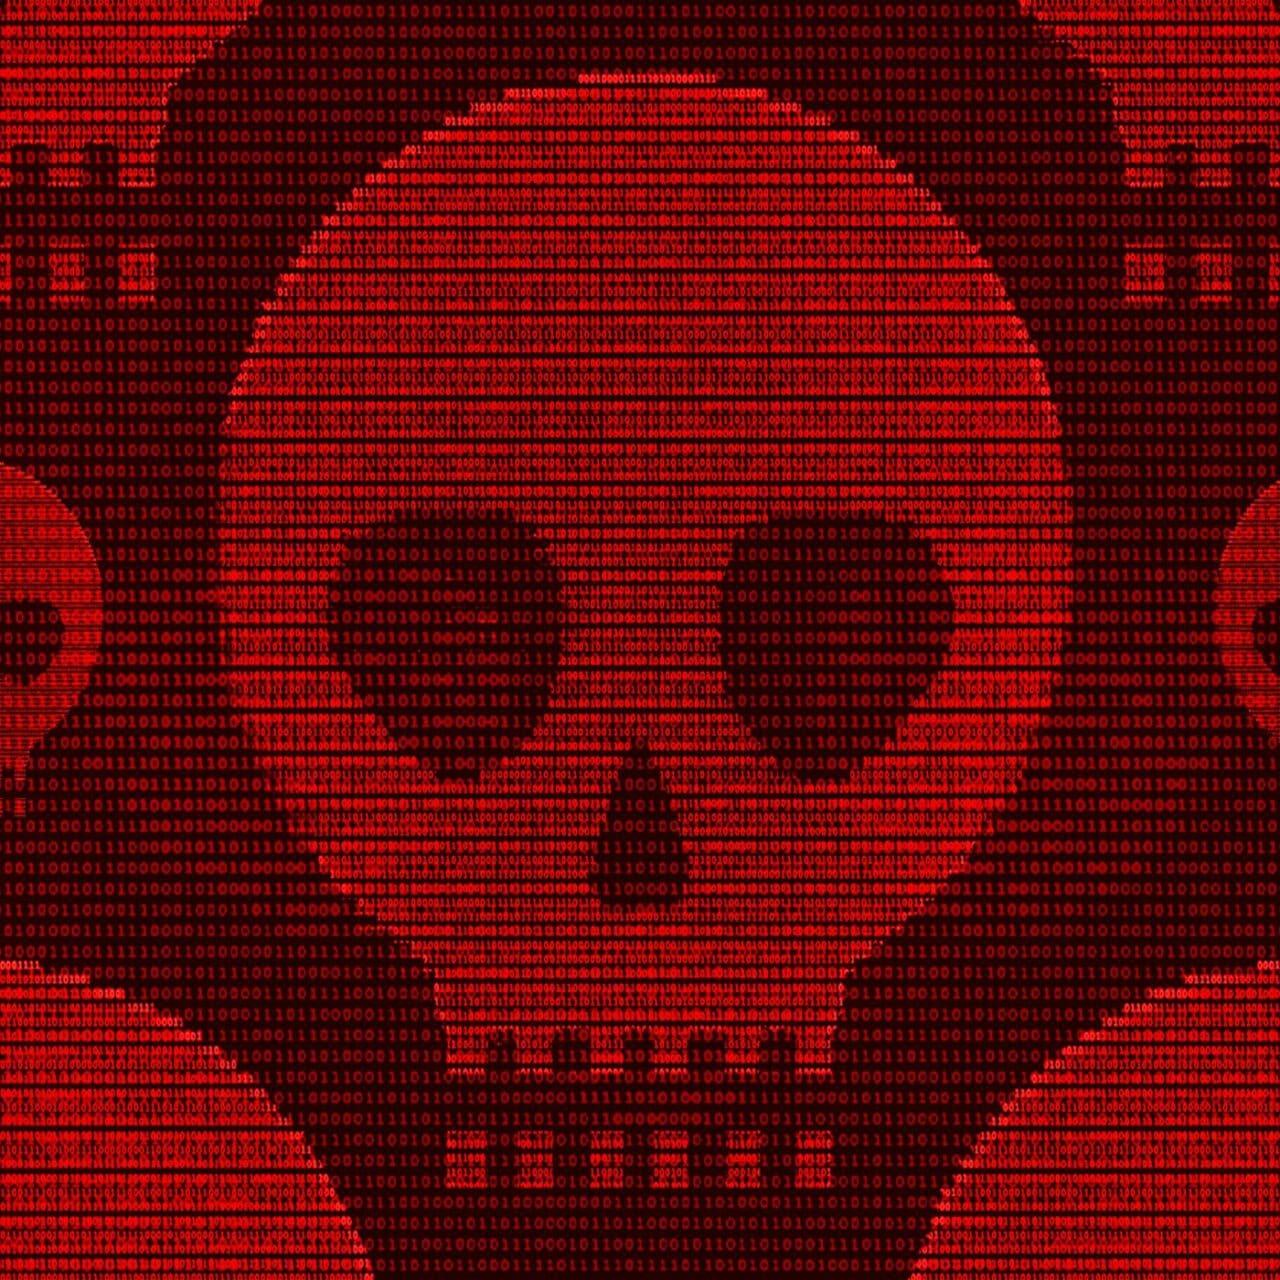 Hacking: oltre 60.000 i clienti di Microsoft Exchange compromessi dall'attacco di Hafnium